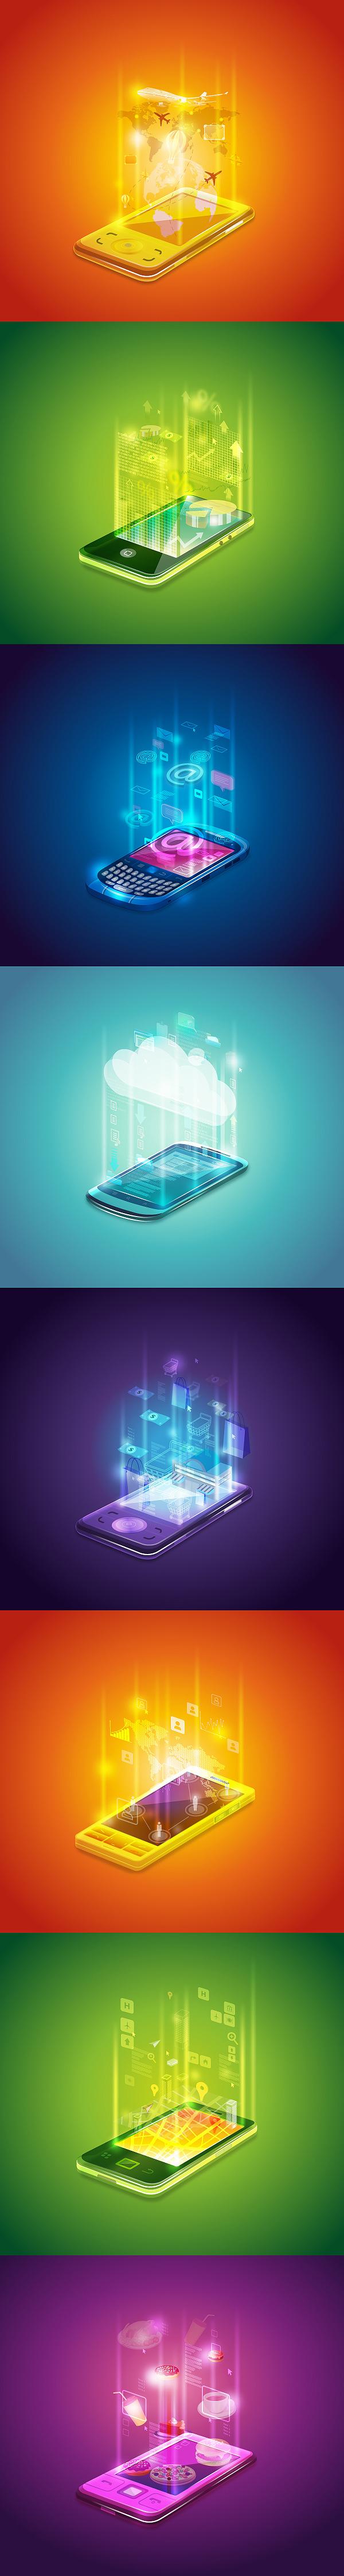 Illustrator claudia rueda oven design Workshop Icon mobile app series holographic digital art vector